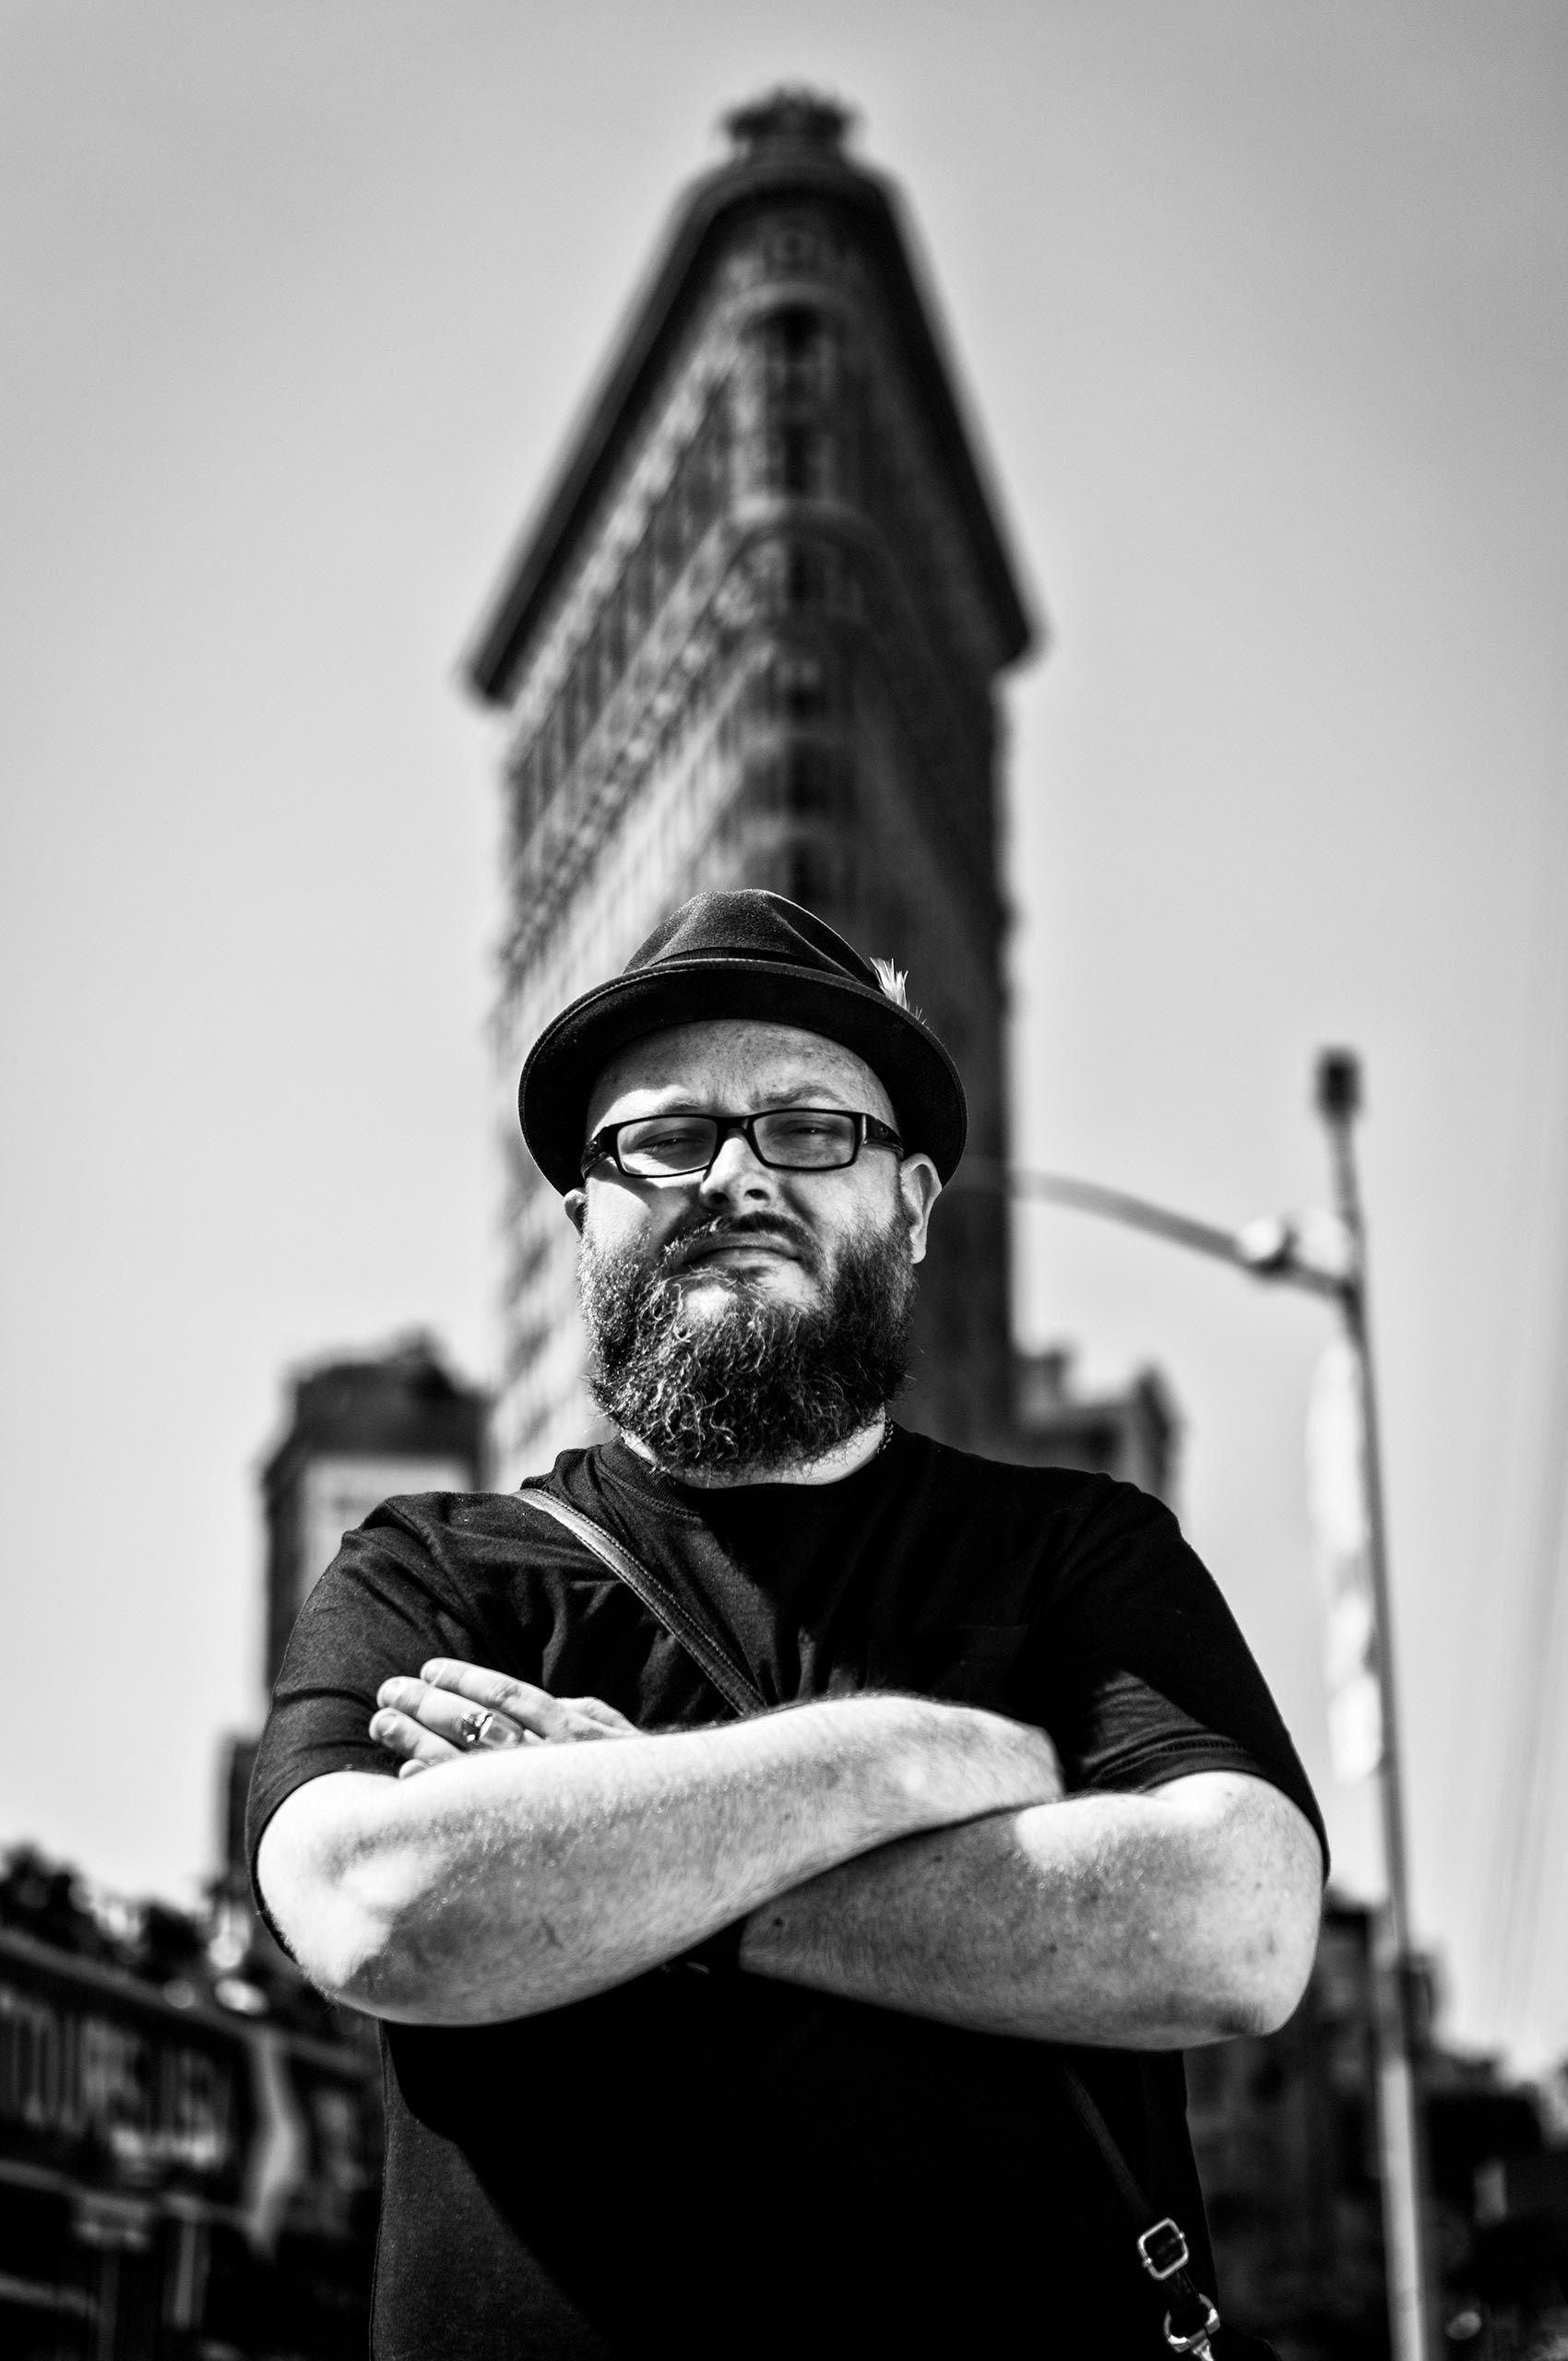 flatiron-hipster-newyork-HenrikOlundPhotography.jpg